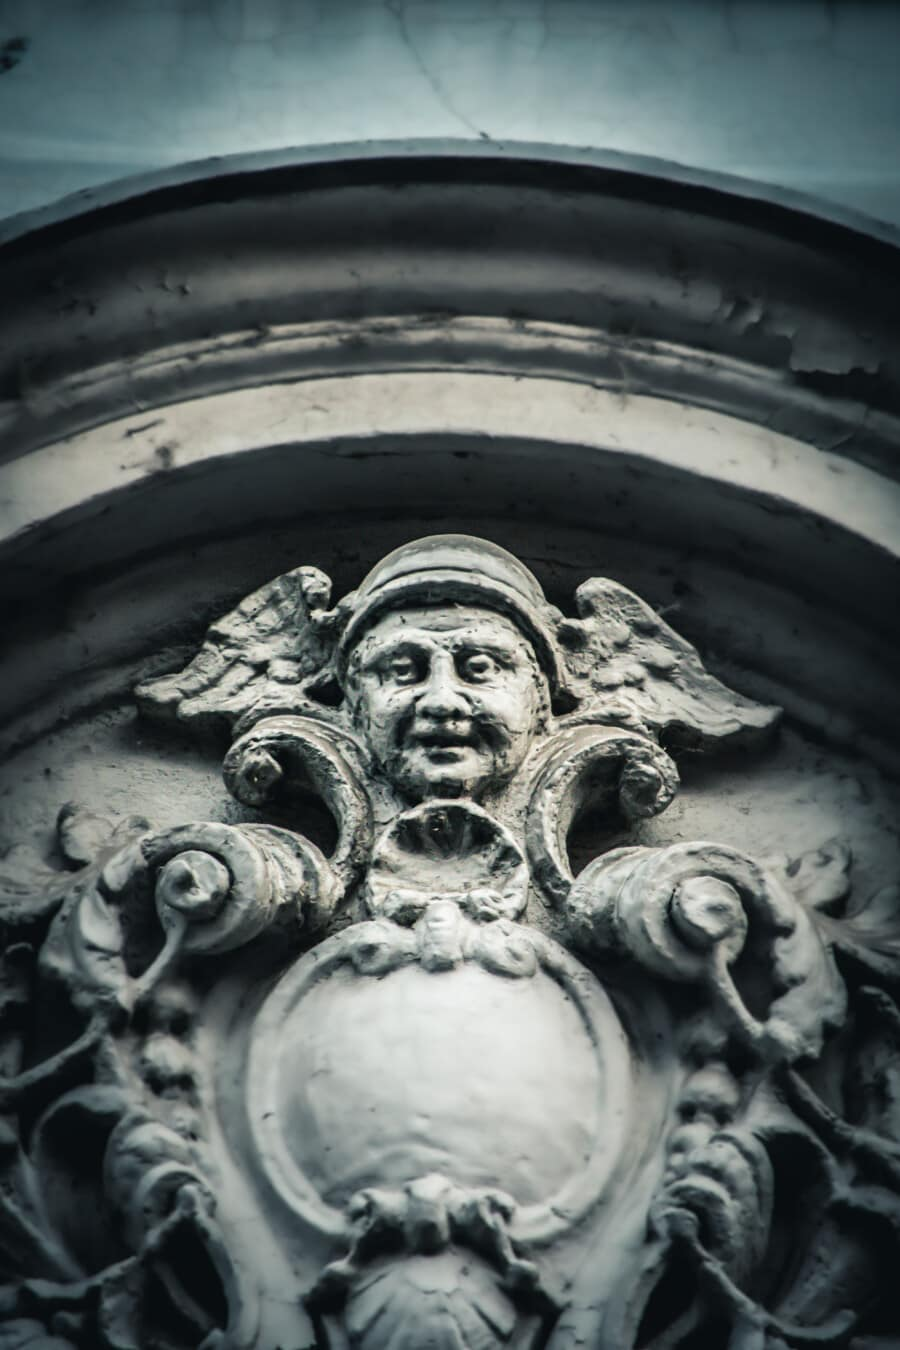 Skulptur, Wand, Barock, Relief, Arch, Flügel, Helm, Kopf, Statue, Antike